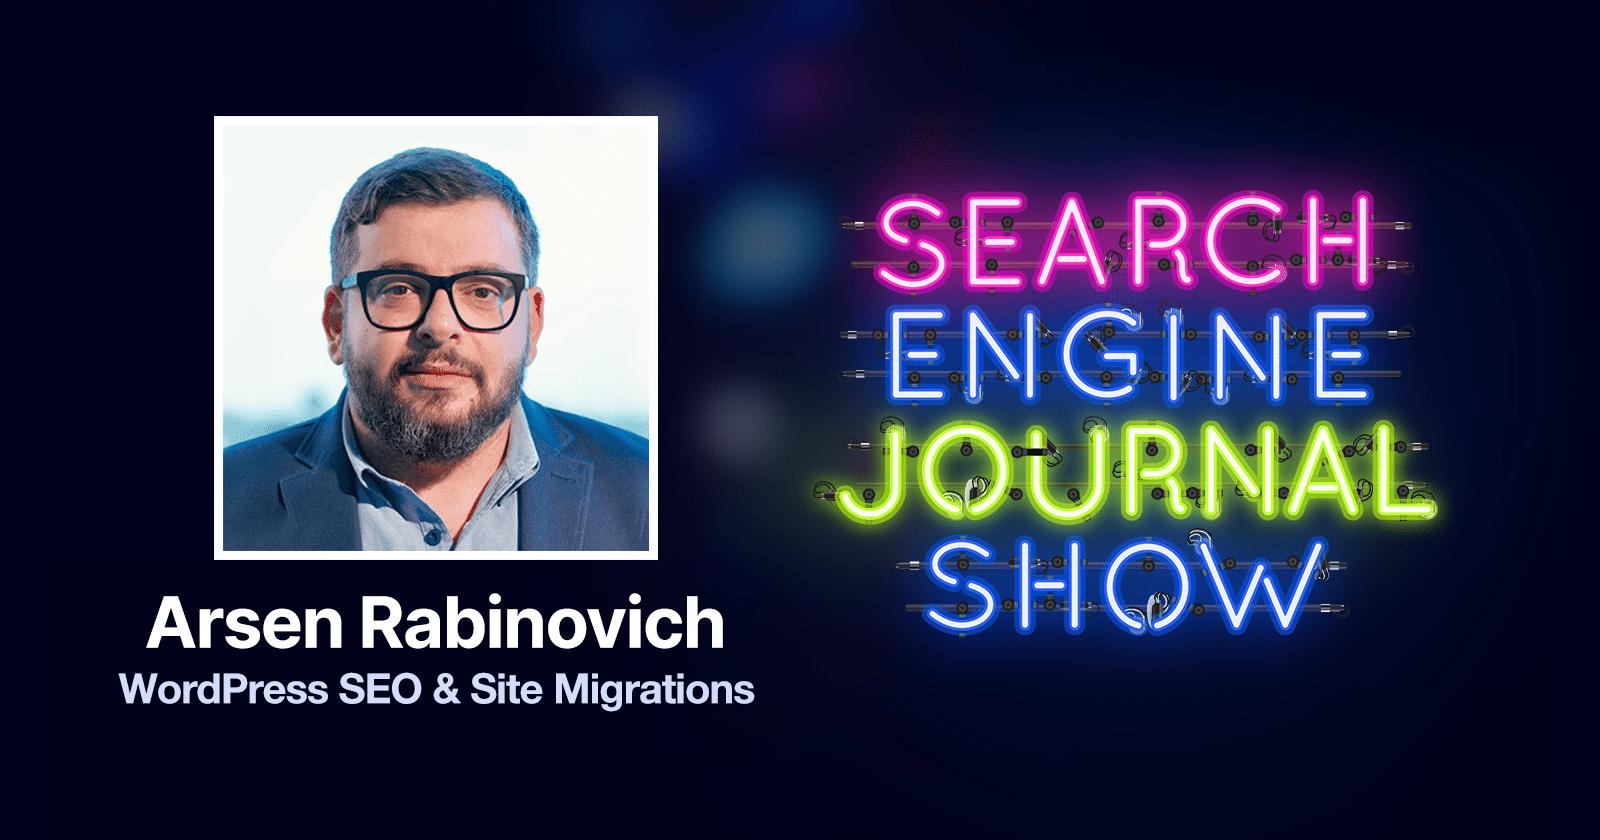 WordPress SEO and Site Migrations with Arsen Rabinovich - Ep. 224 via @sejournal, @brentcsutoras